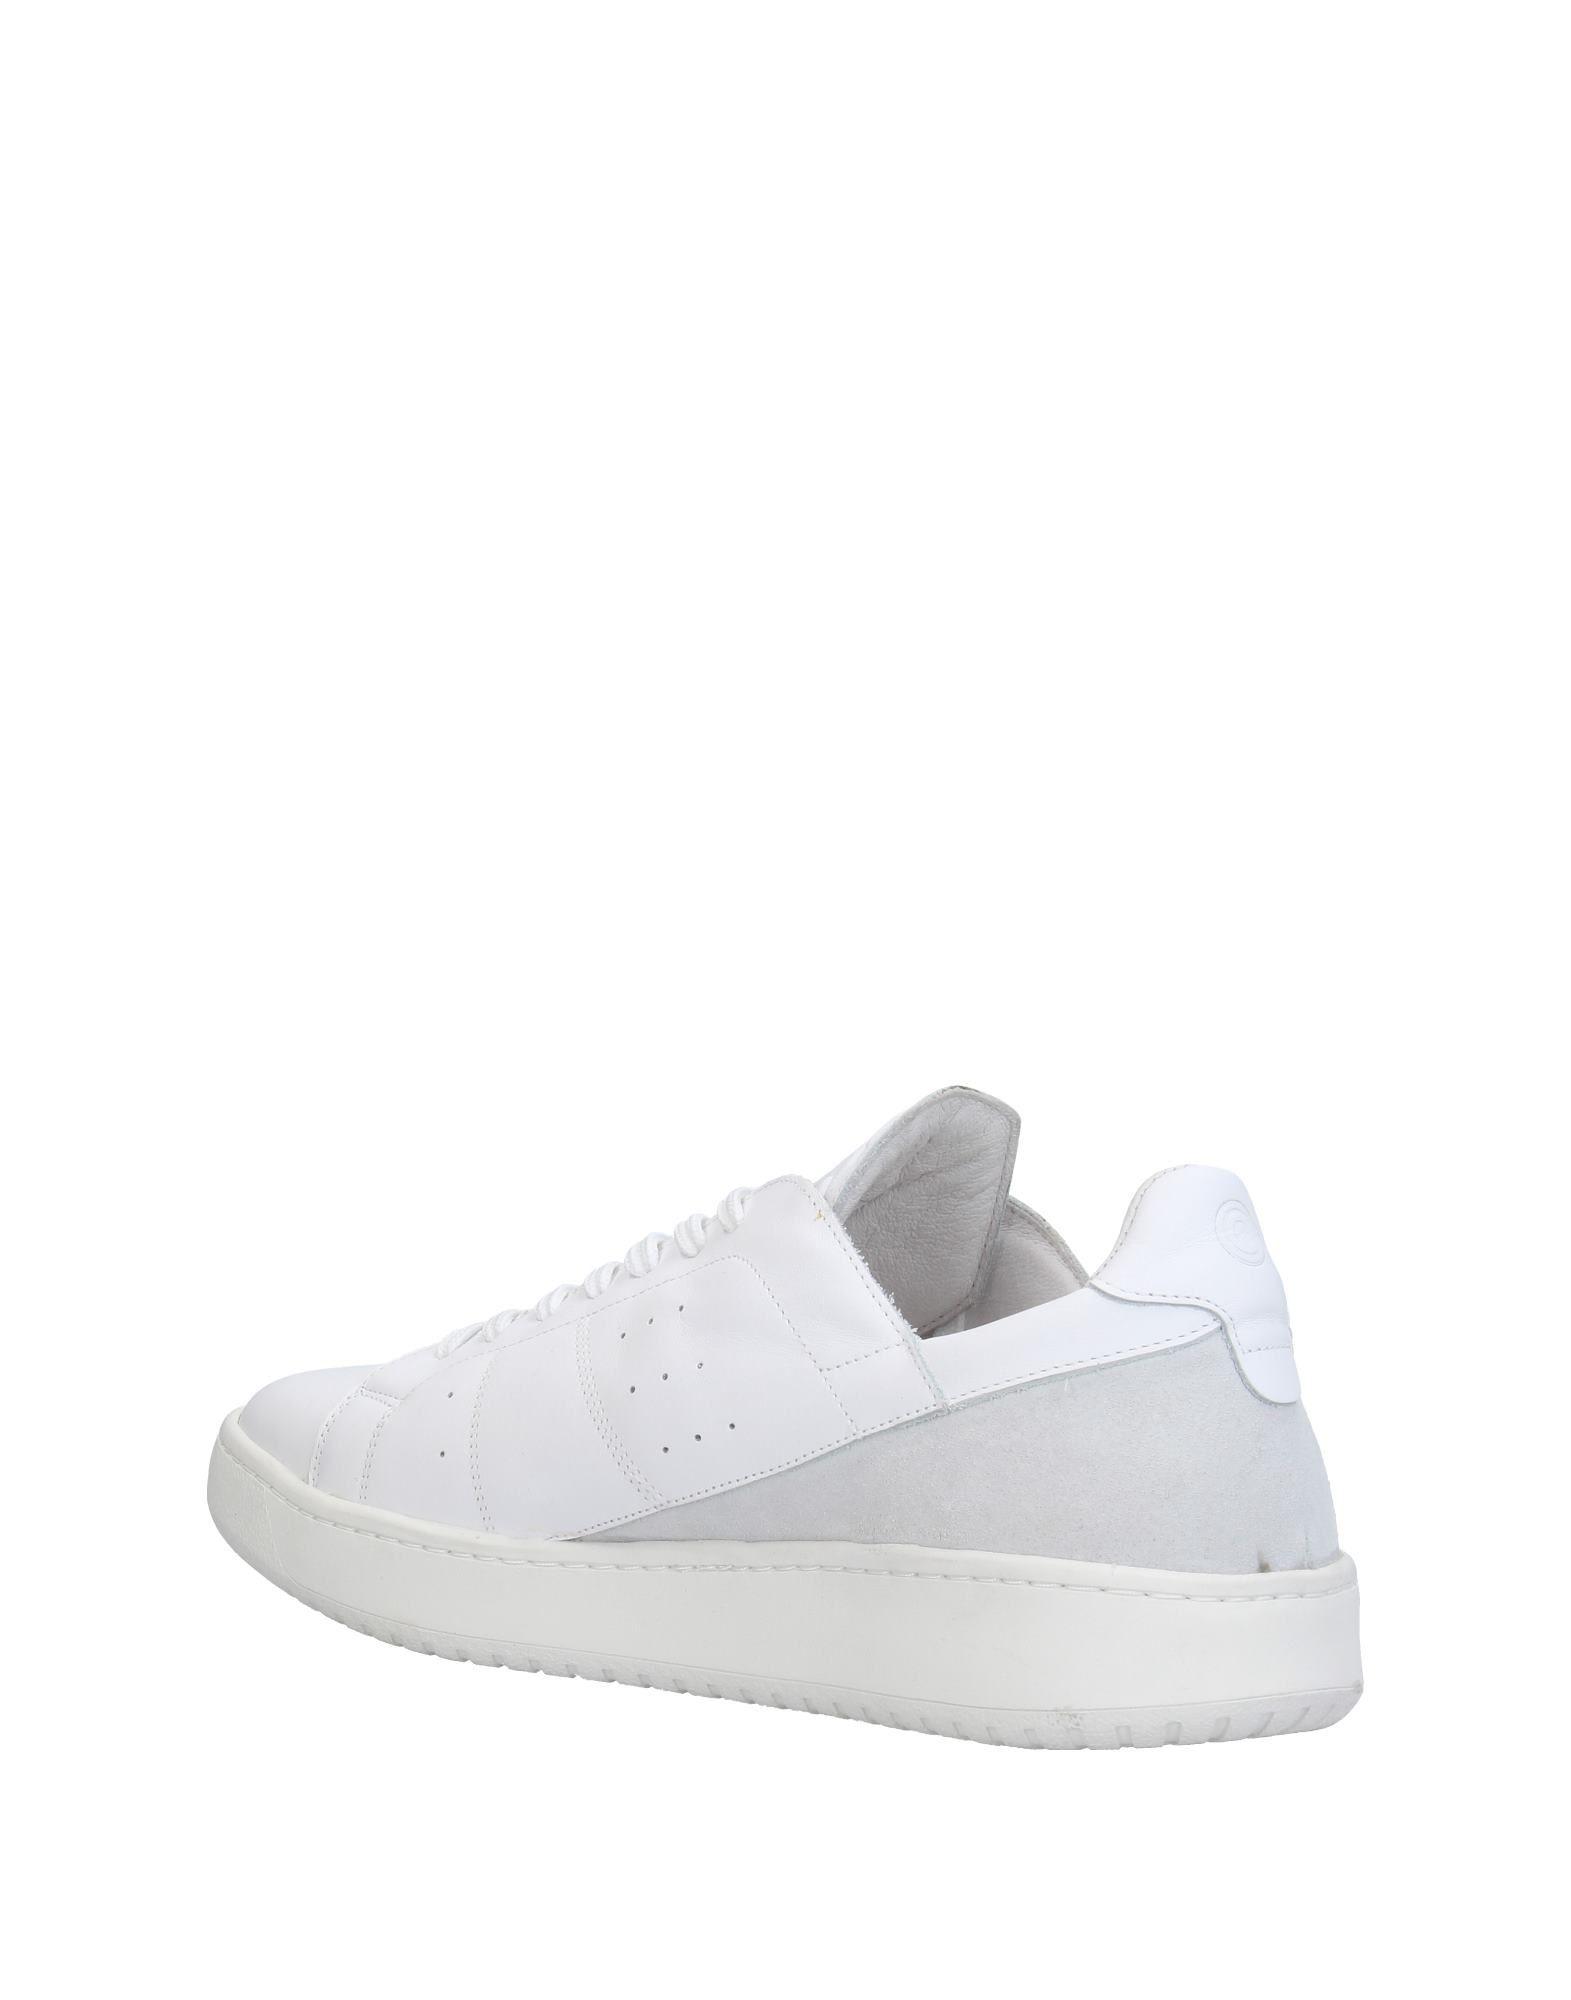 Rabatt echte Sneakers Schuhe Colmar Sneakers echte Herren  11403127UQ a21da1